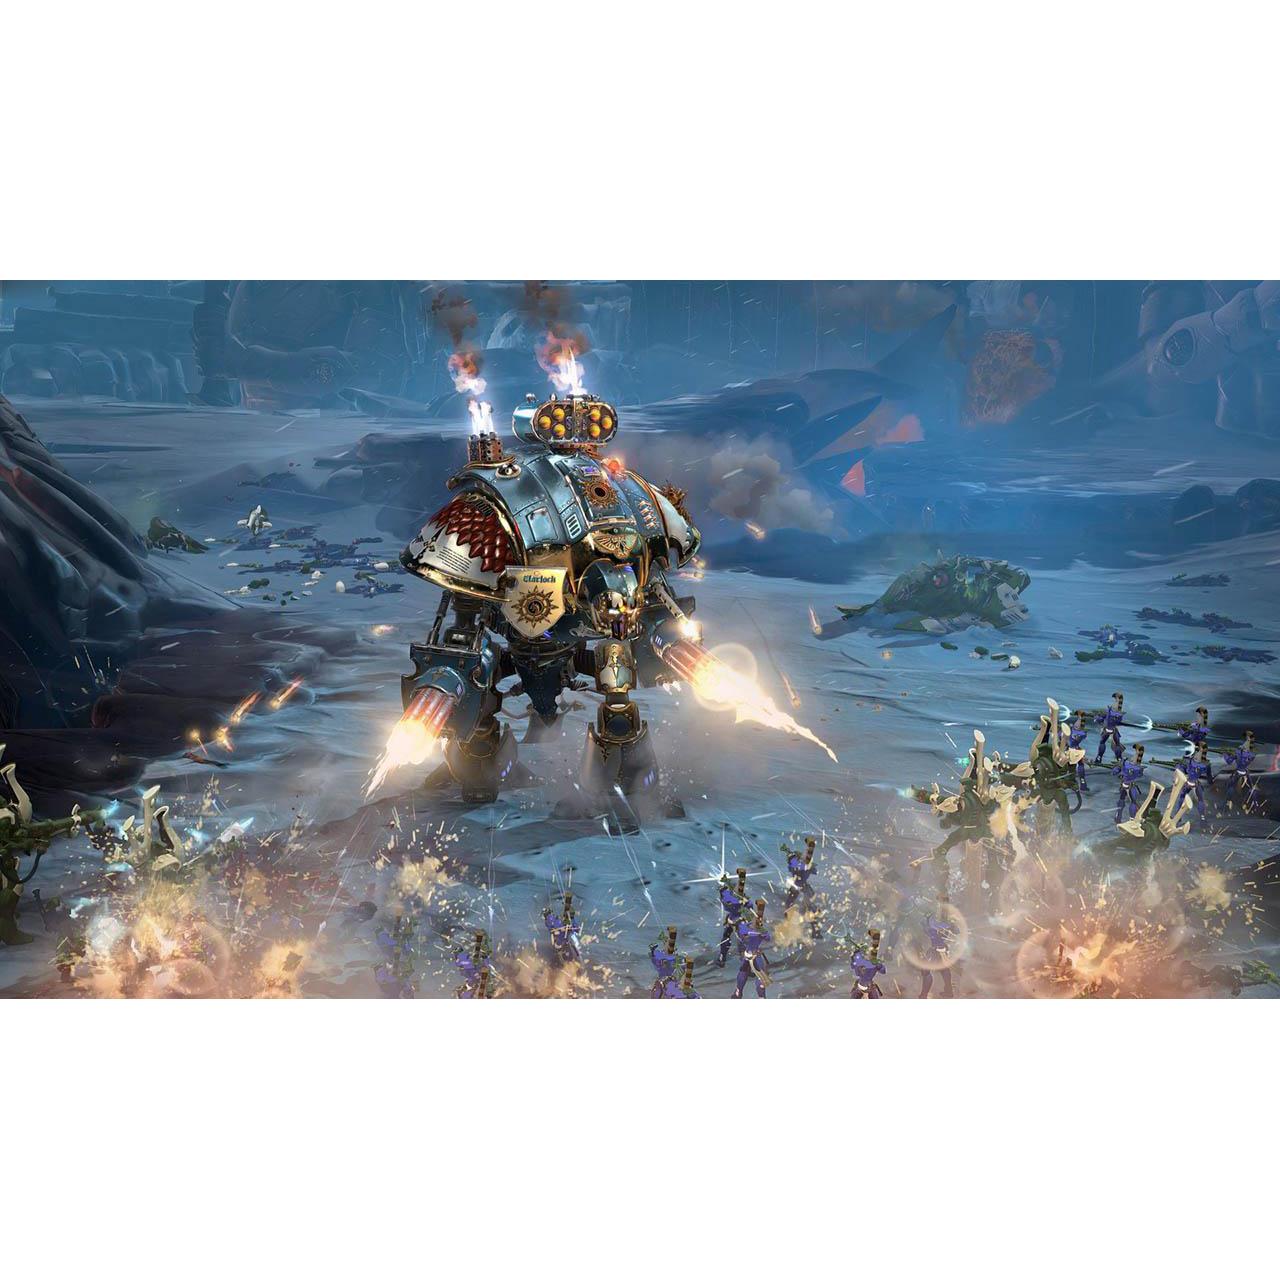 Joc Dawn Of War 3 Limited Edition pentru PC 2